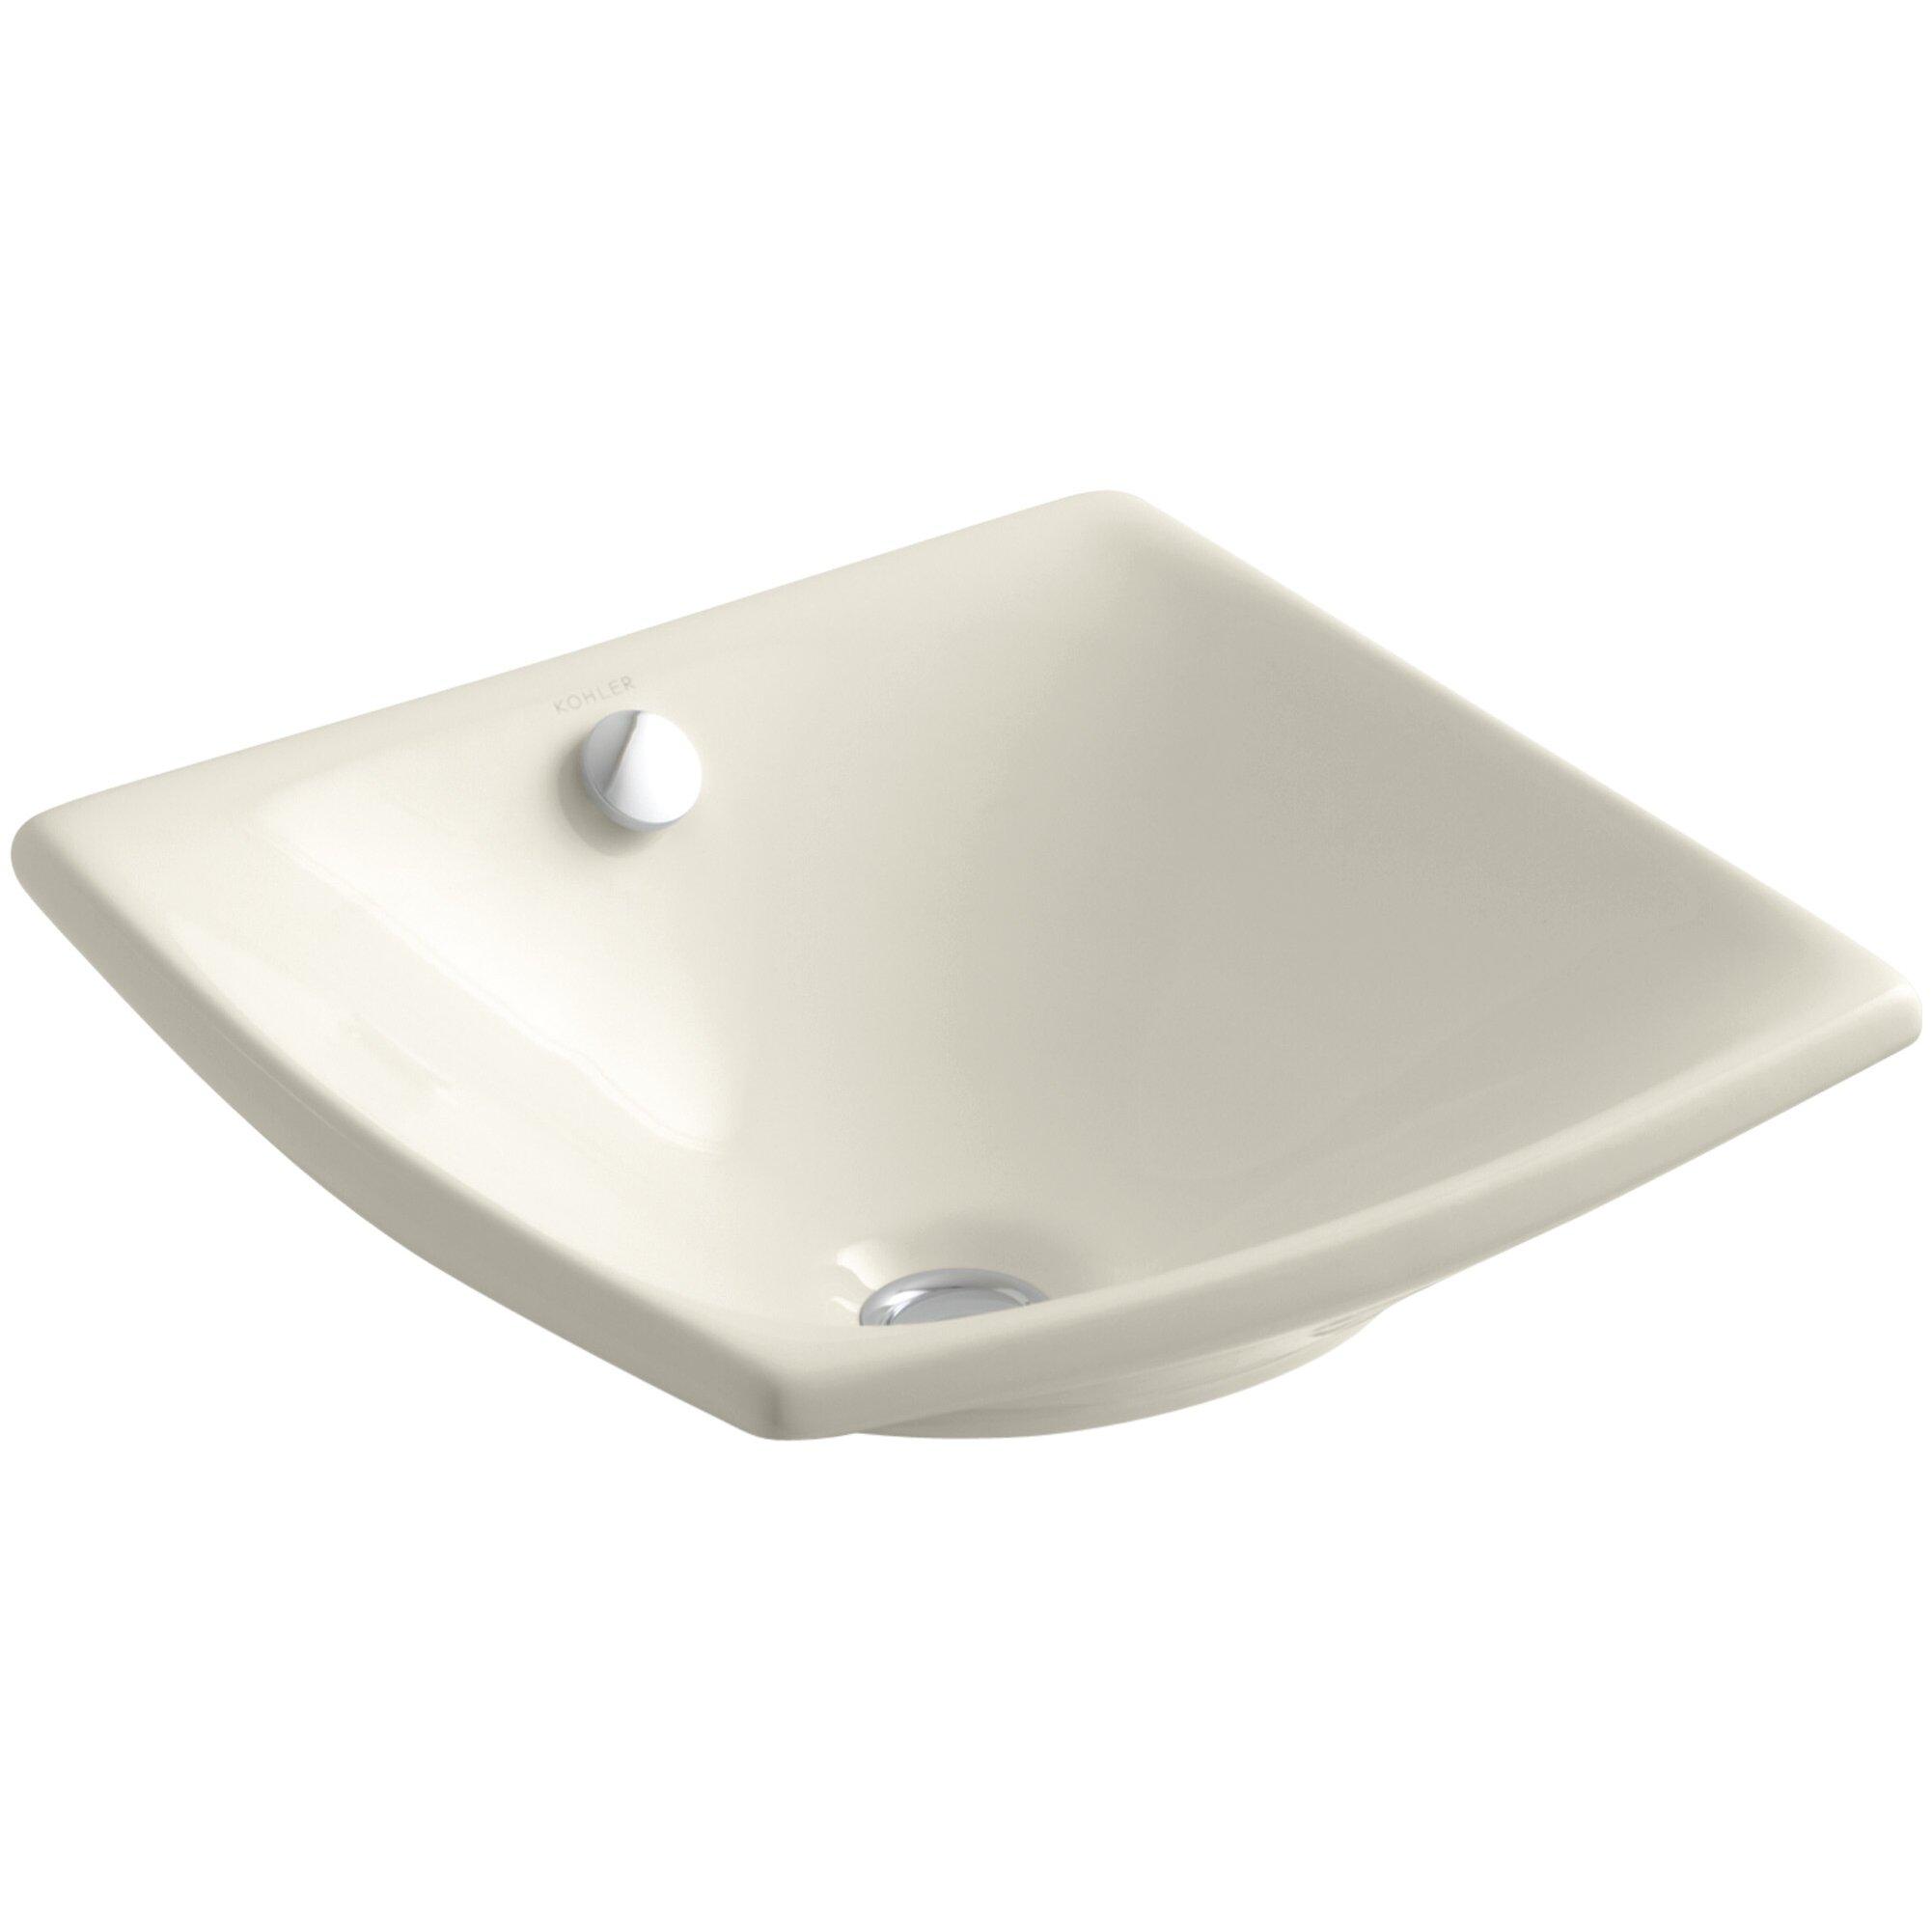 Kohler Escale Vessel Above Counter Bathroom Sink With